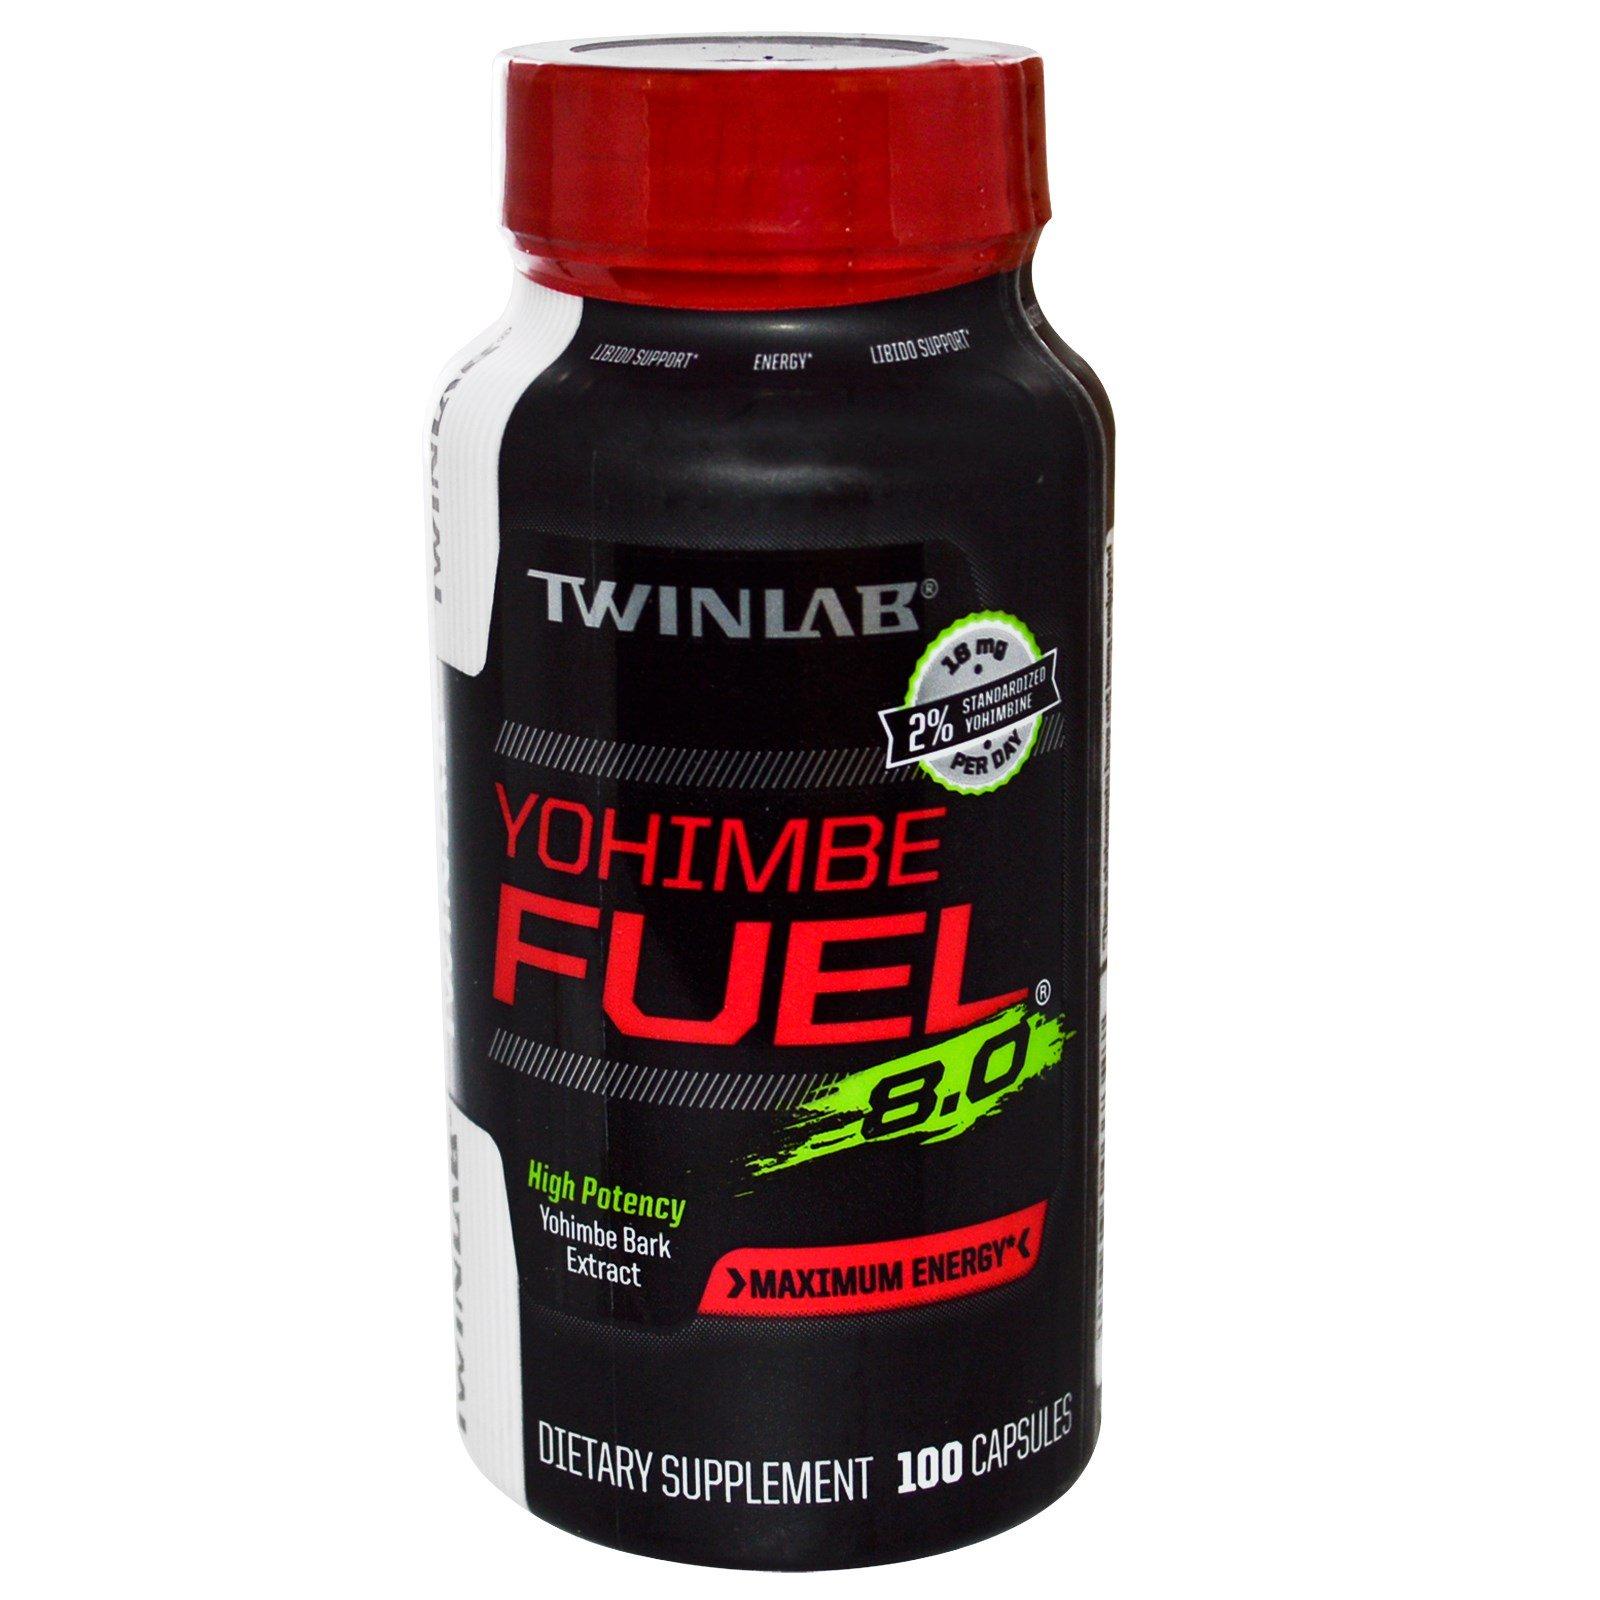 Twinlab, Yohimbe Fuel, 8.0., максимальная энергия, 100 капсул